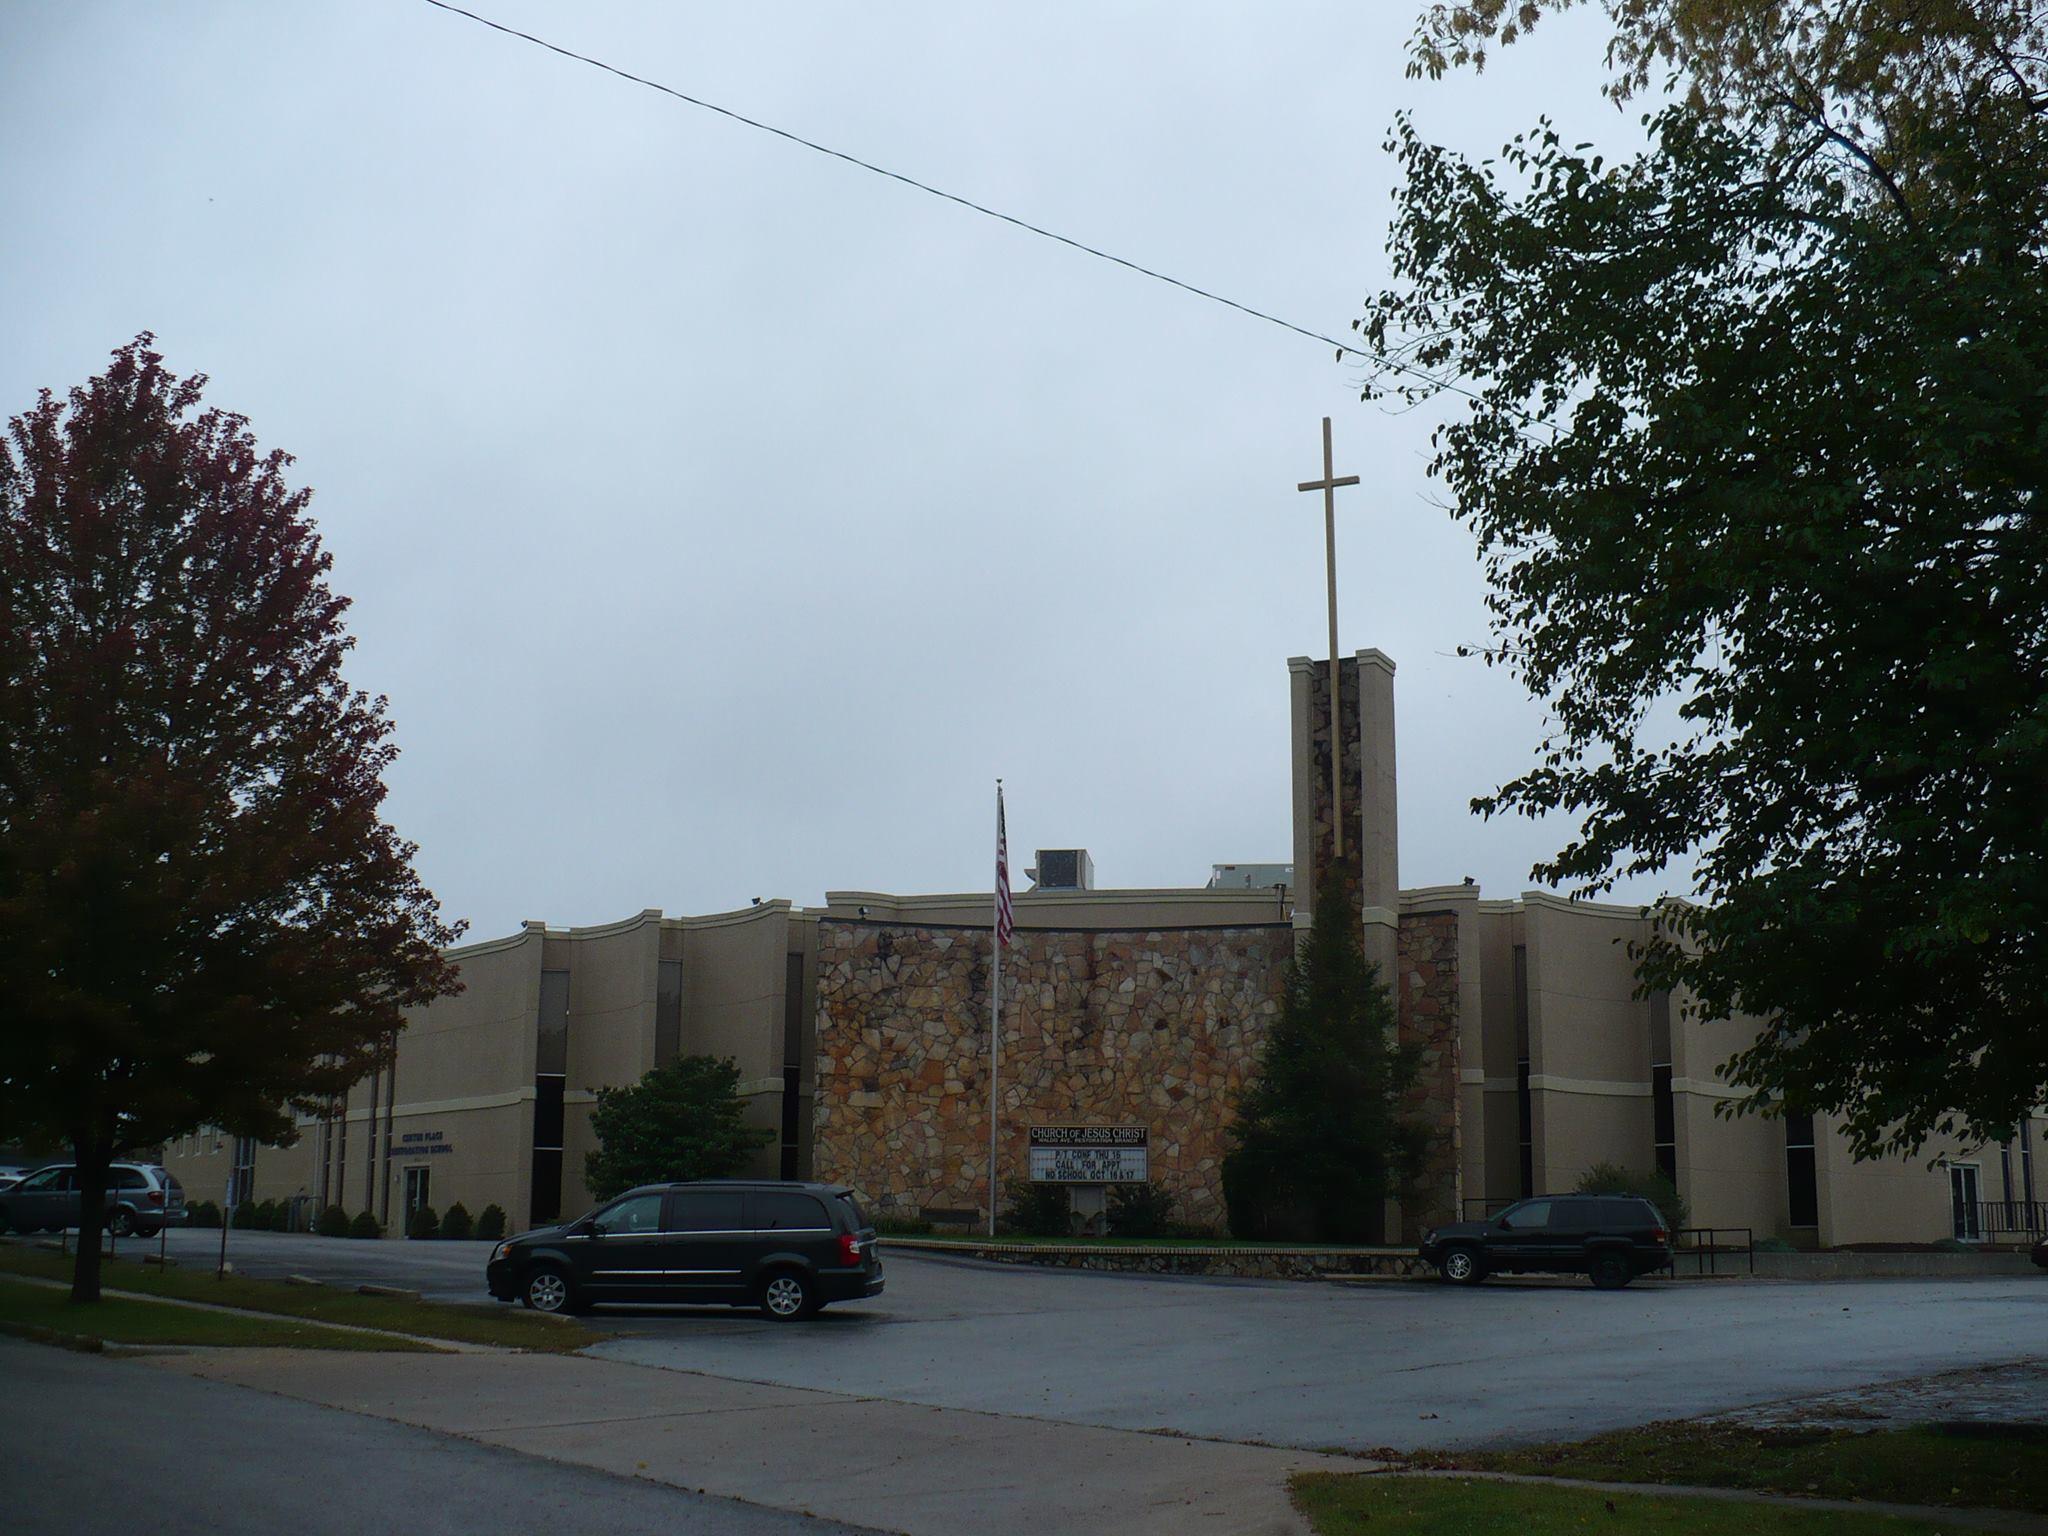 Center Place Restoration School's Facebook page